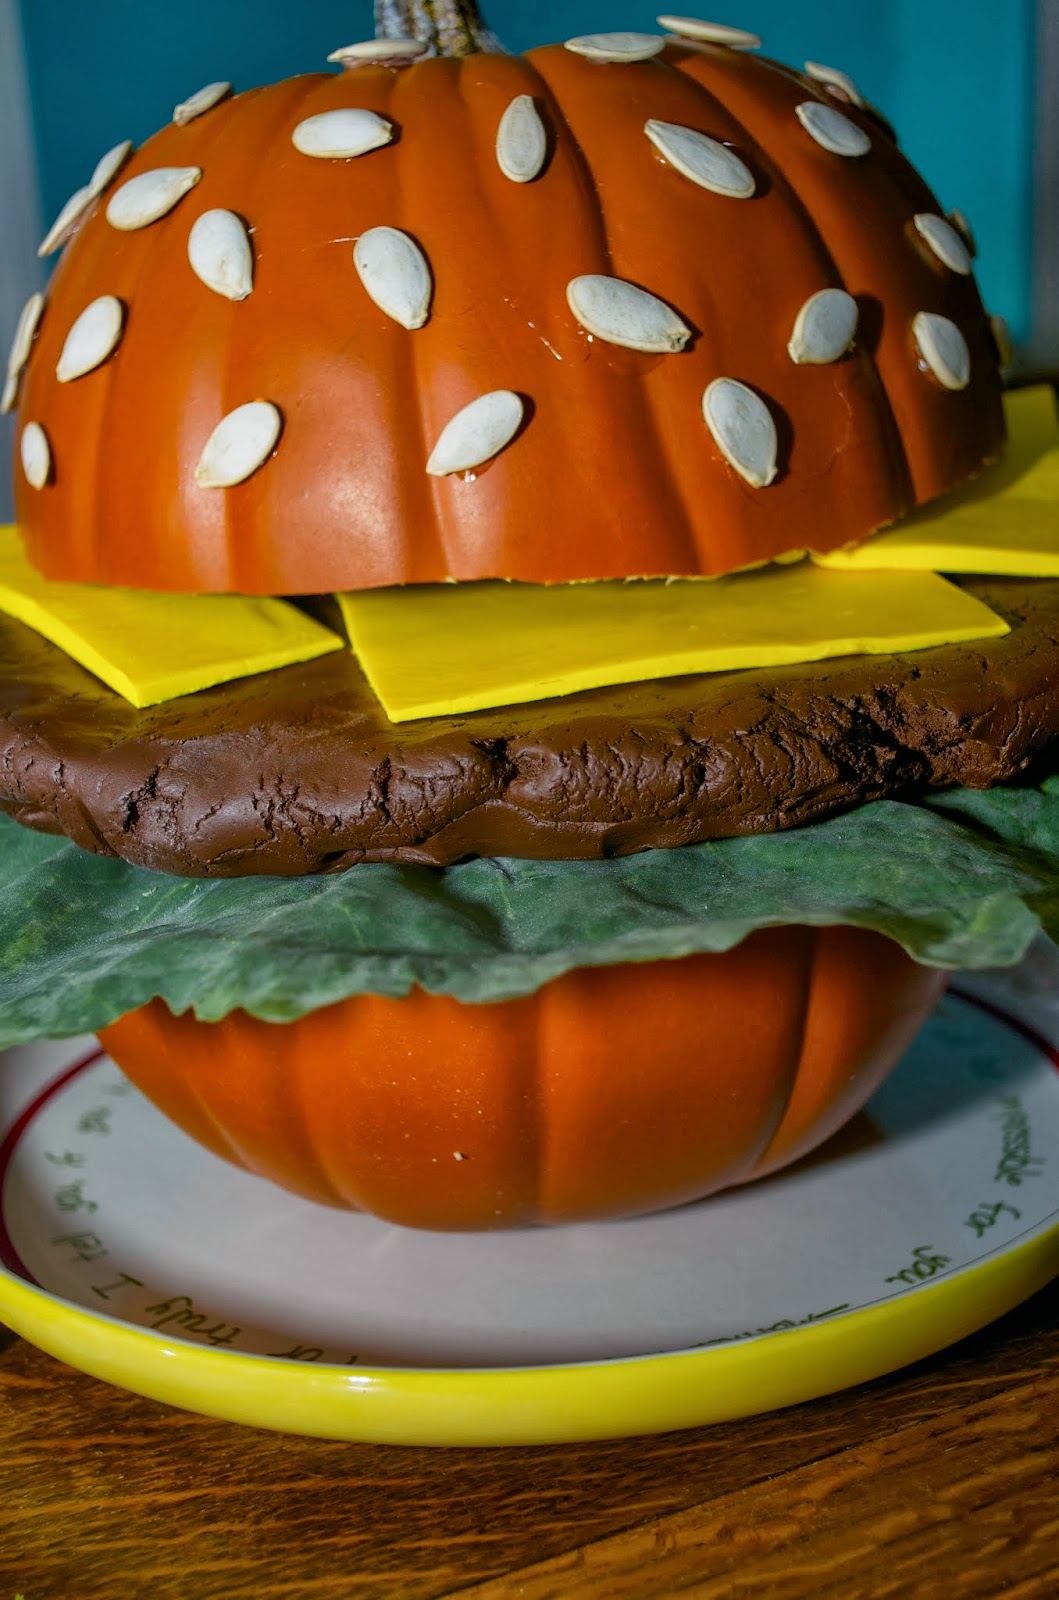 Crazy cozads pumpkin decorating cheeseburger for A pumpkin decoration